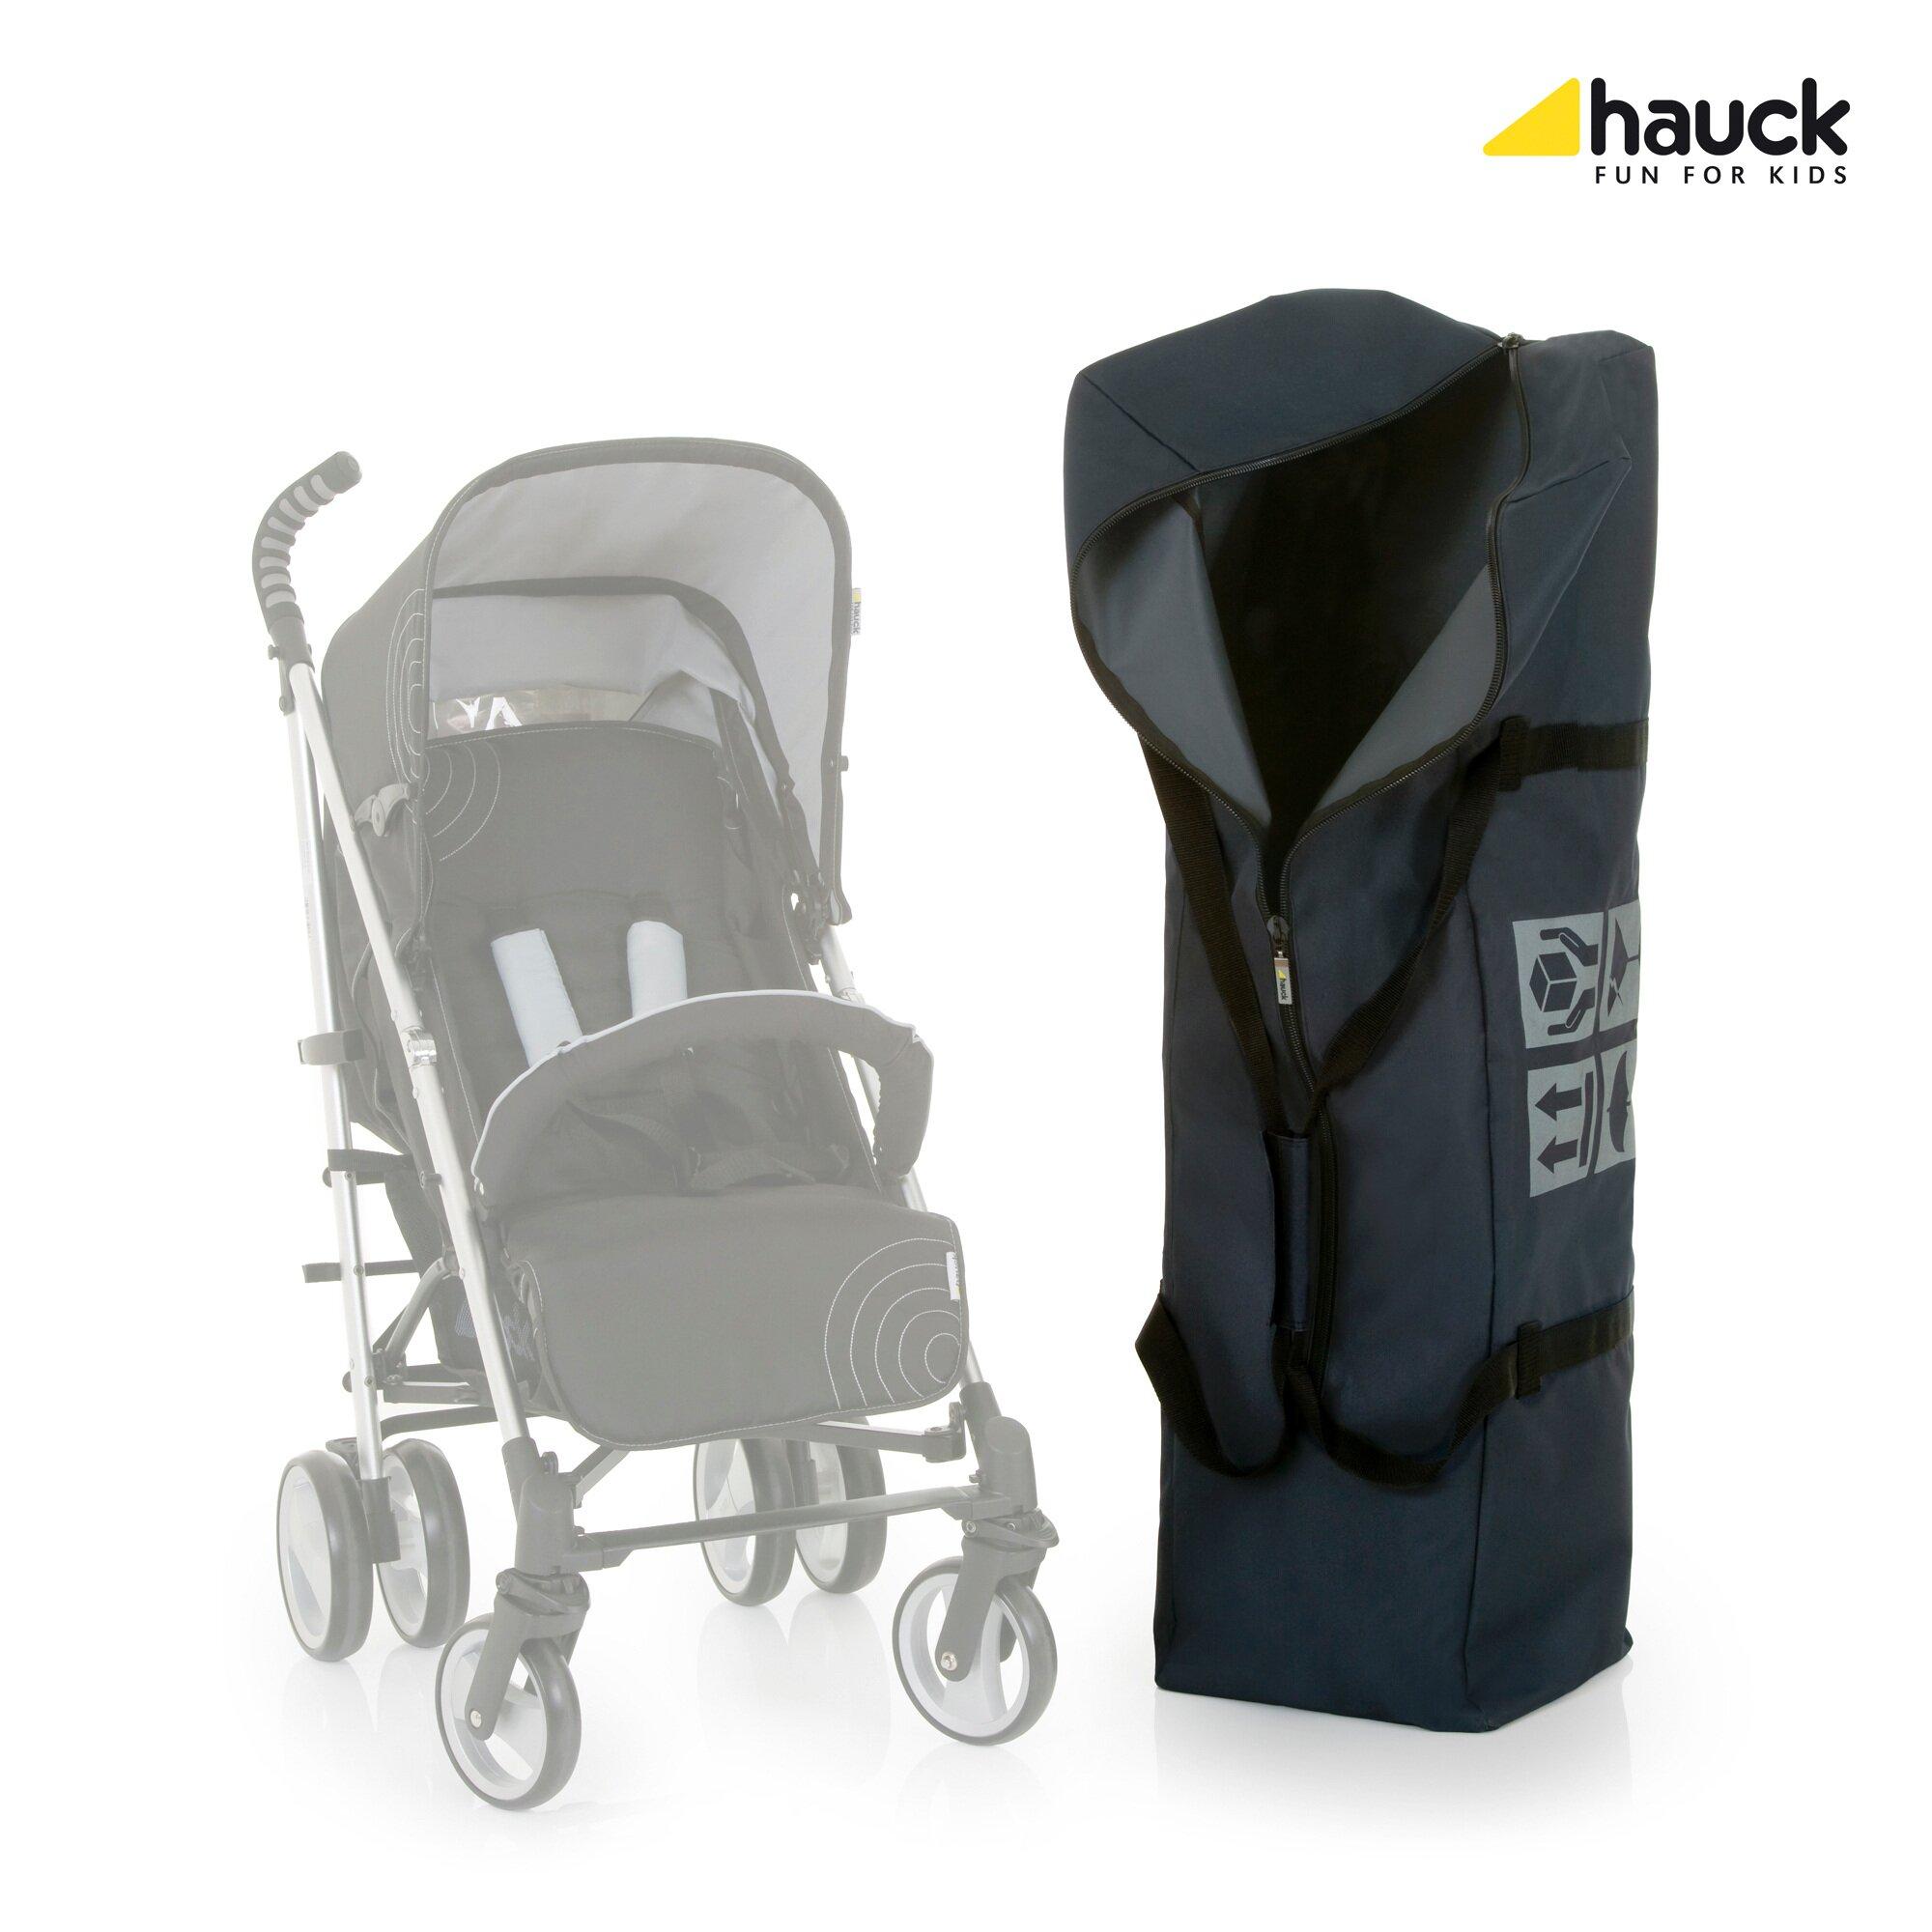 hauck-transporttasche-bag-me-schwarz, 19.09 EUR @ babywalz-de